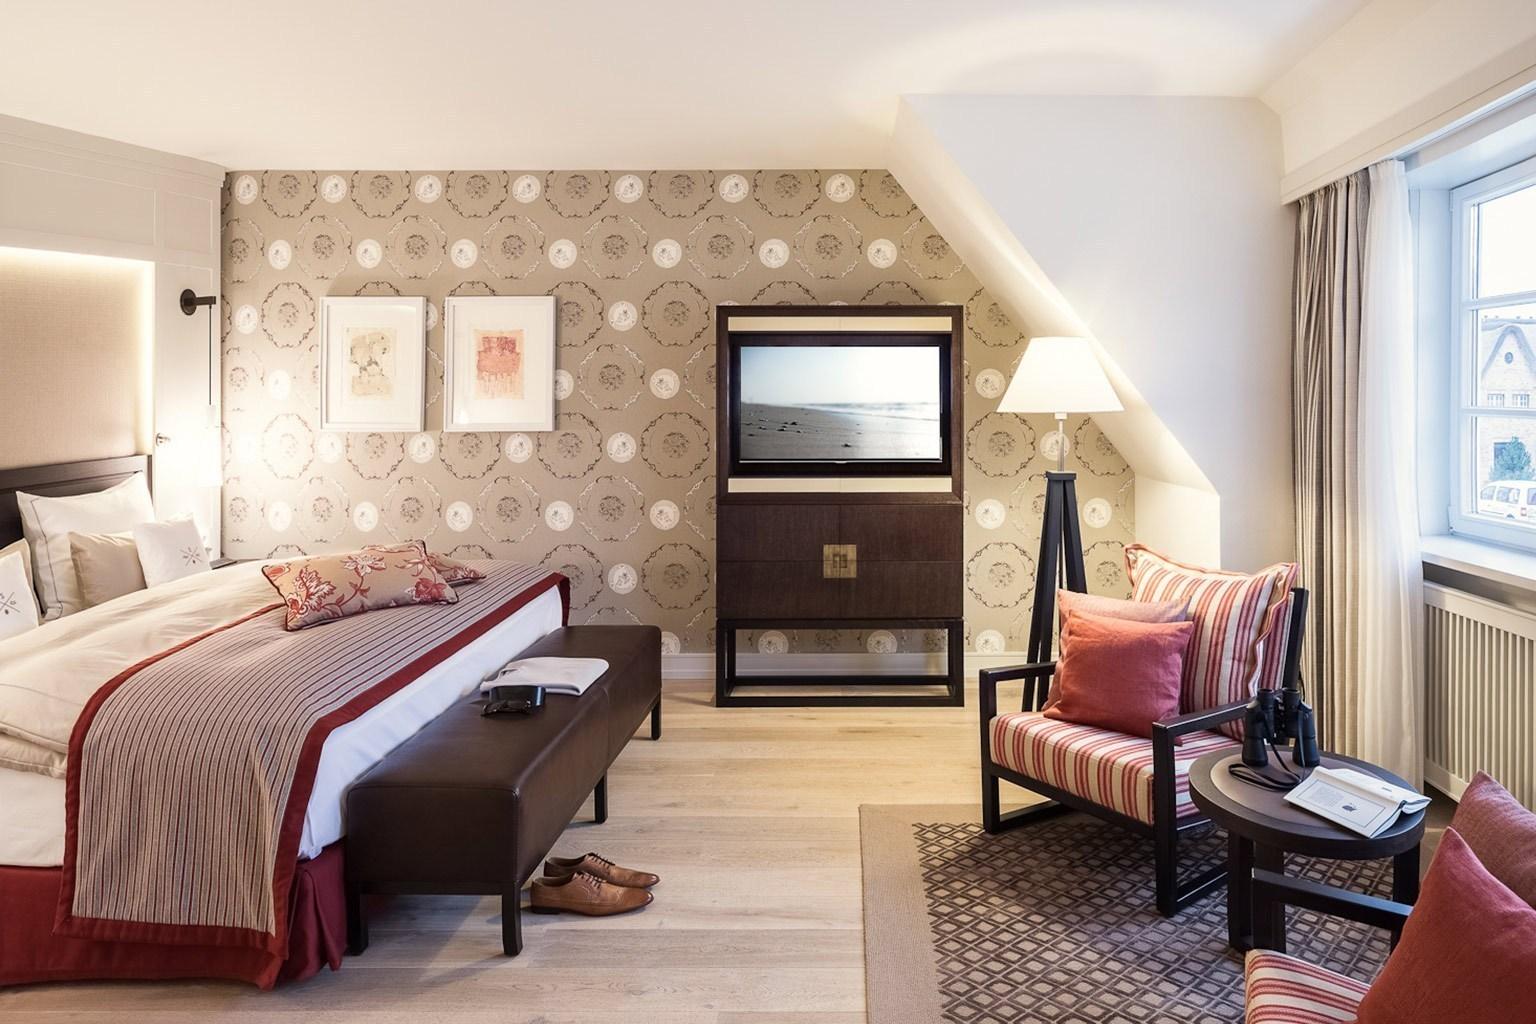 severin s resort spa sylt luxushotel bei designreisen. Black Bedroom Furniture Sets. Home Design Ideas